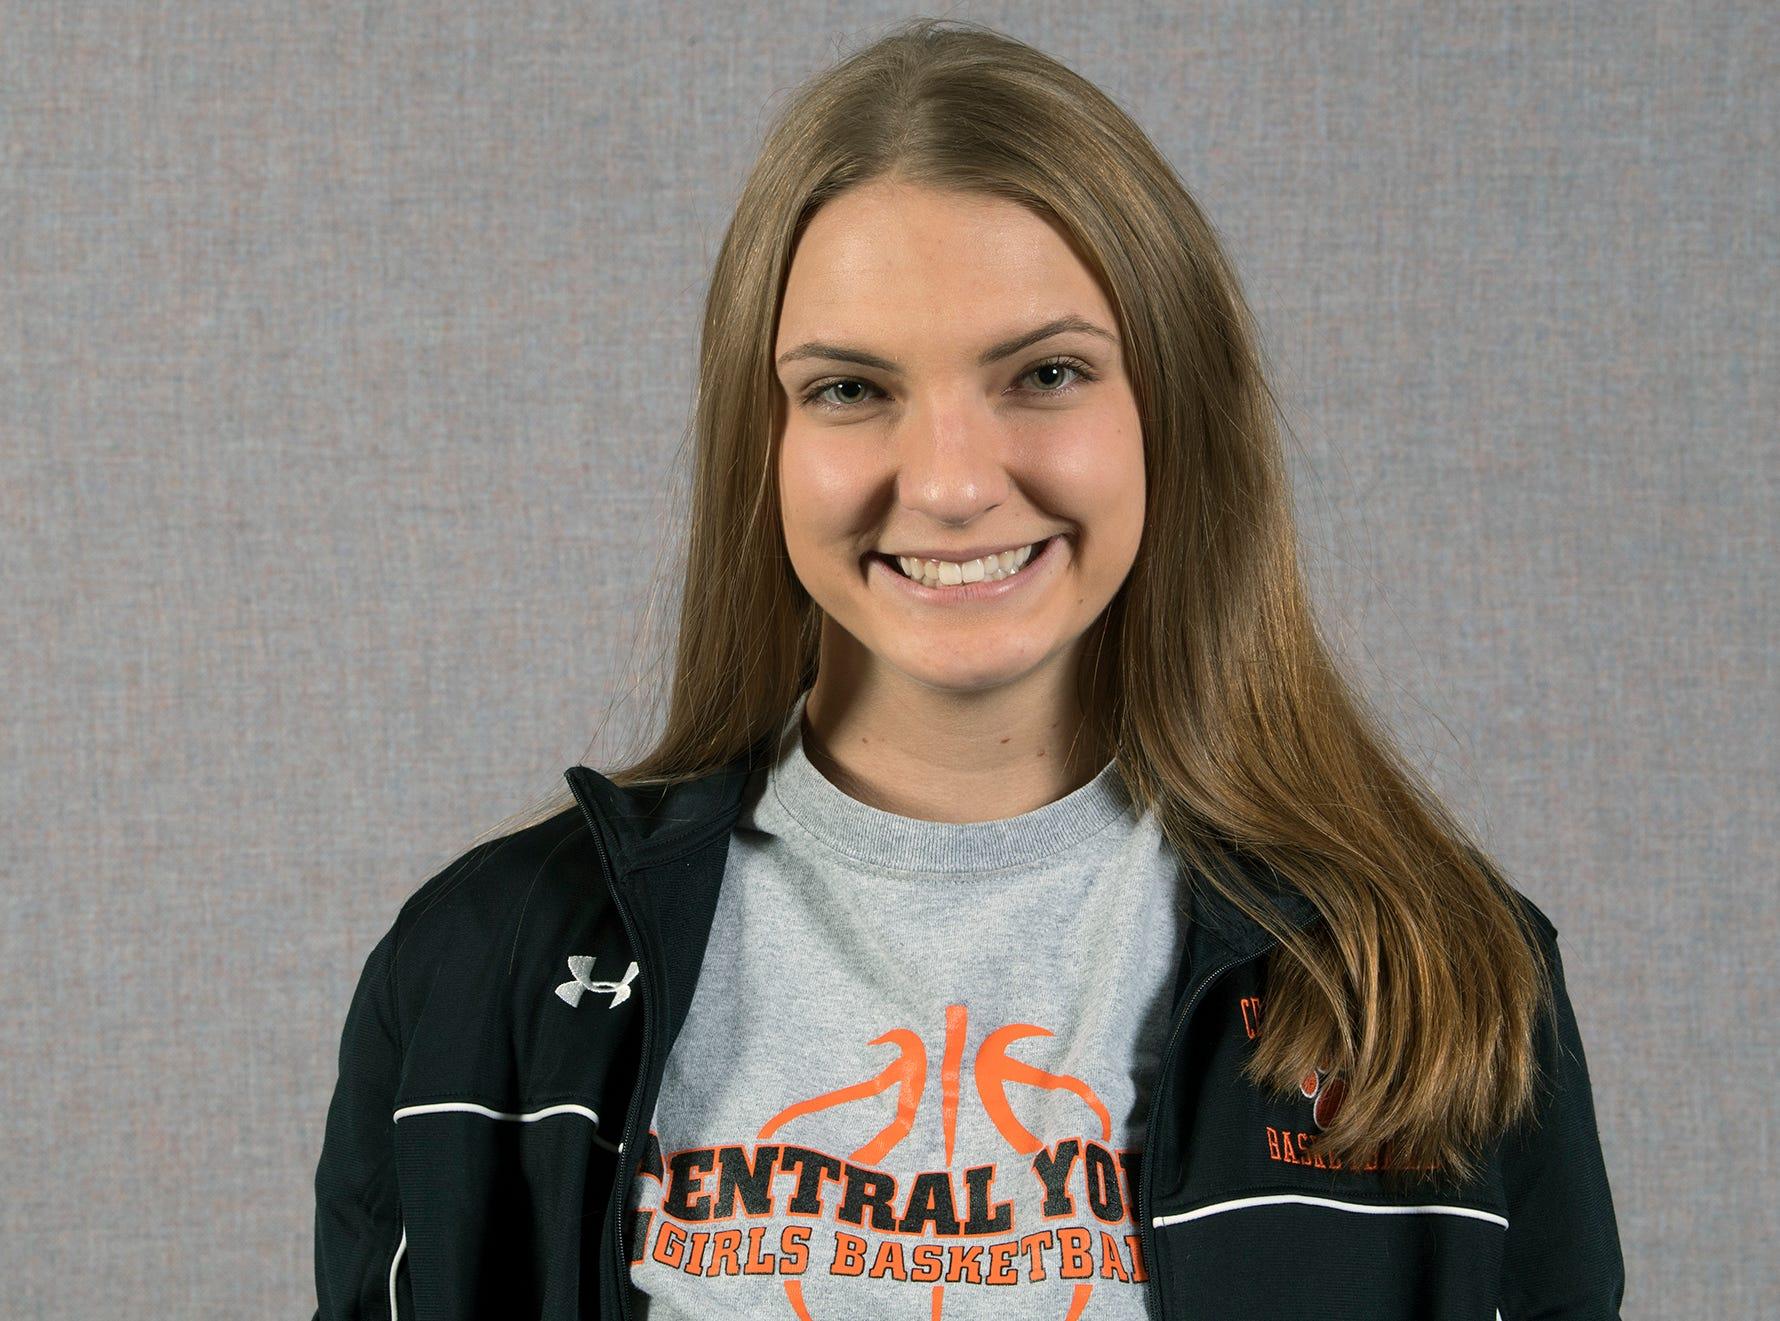 Katie Fabbri, Central York High School Basketball, during the 2018-19 GameTimePa YAIAA Winter Media Day Sunday November 11, 2018.